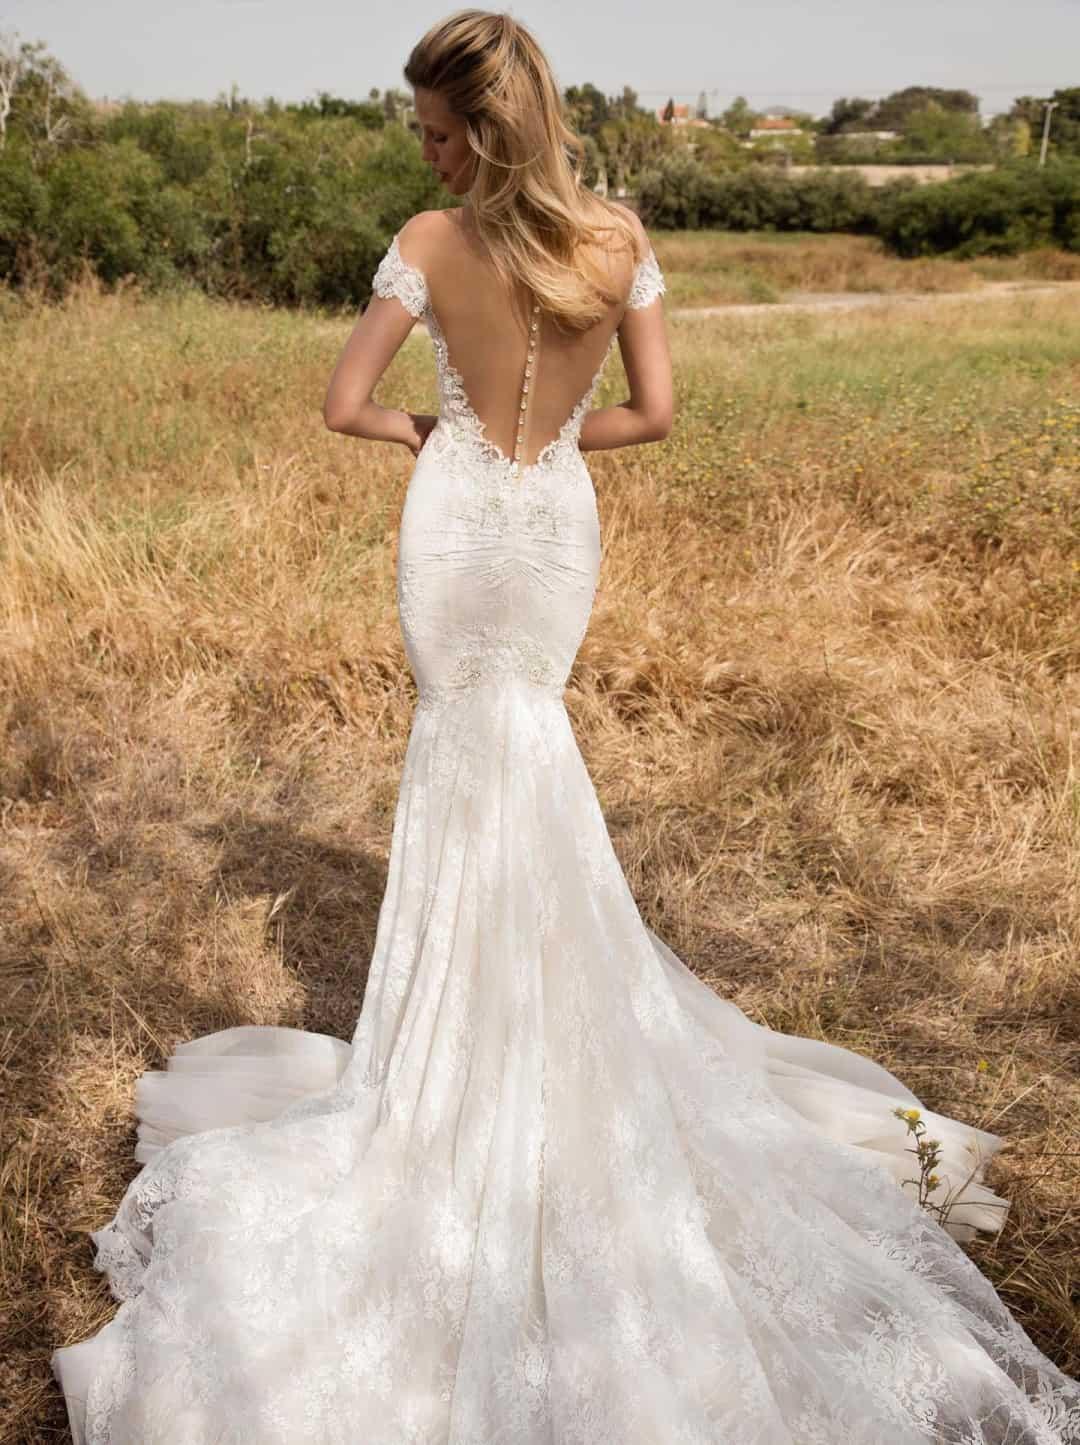 Haute Couture Wedding Dresses - Gala-702-back